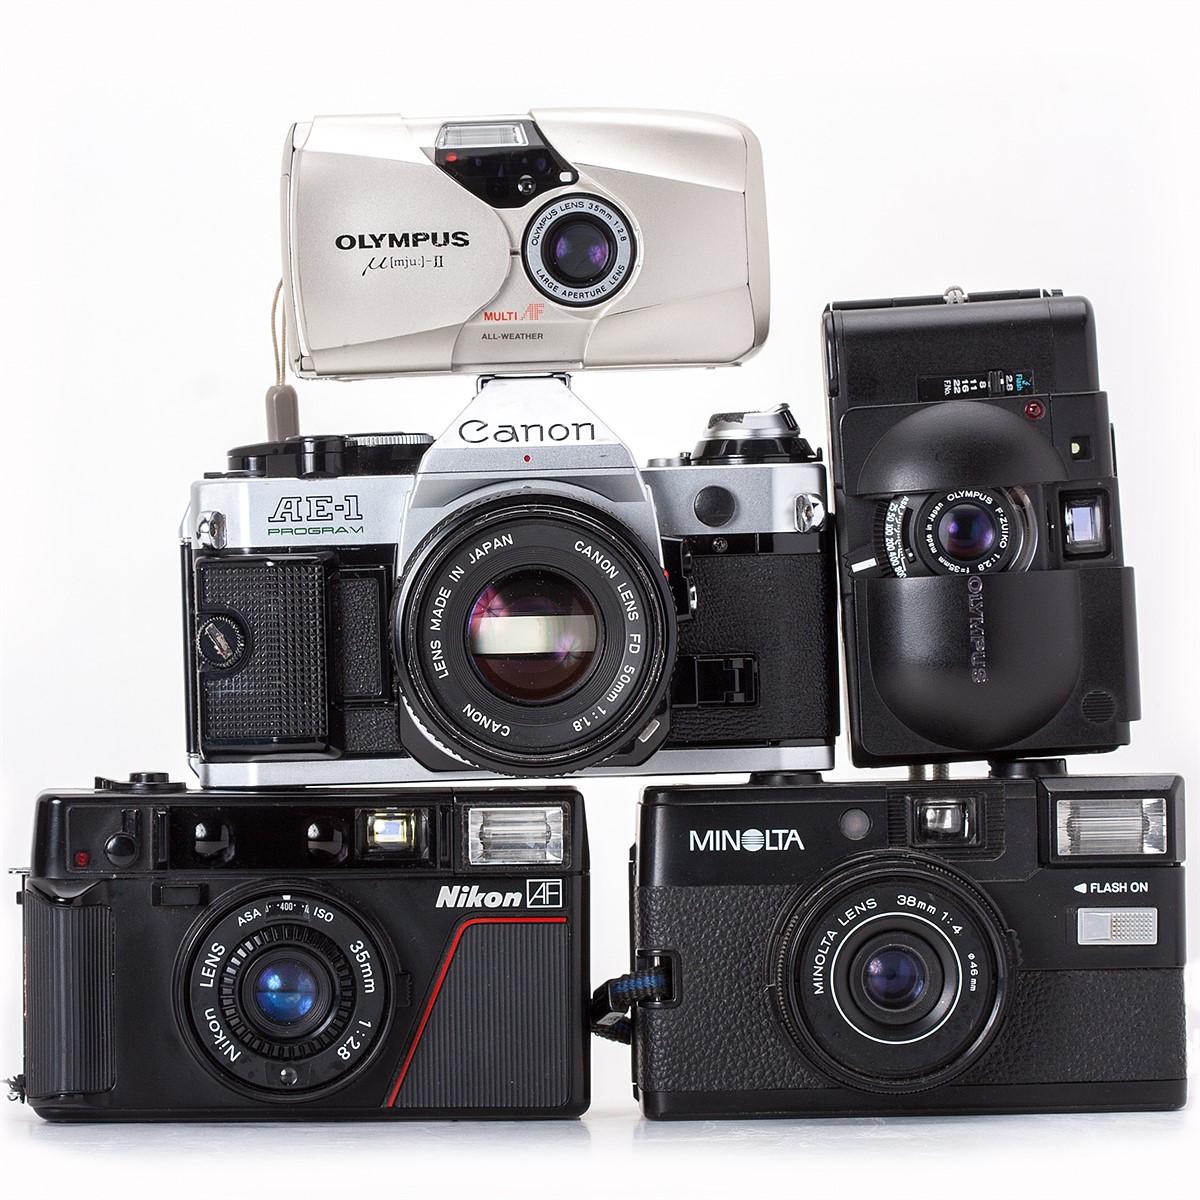 Top ten digital cameras under 100